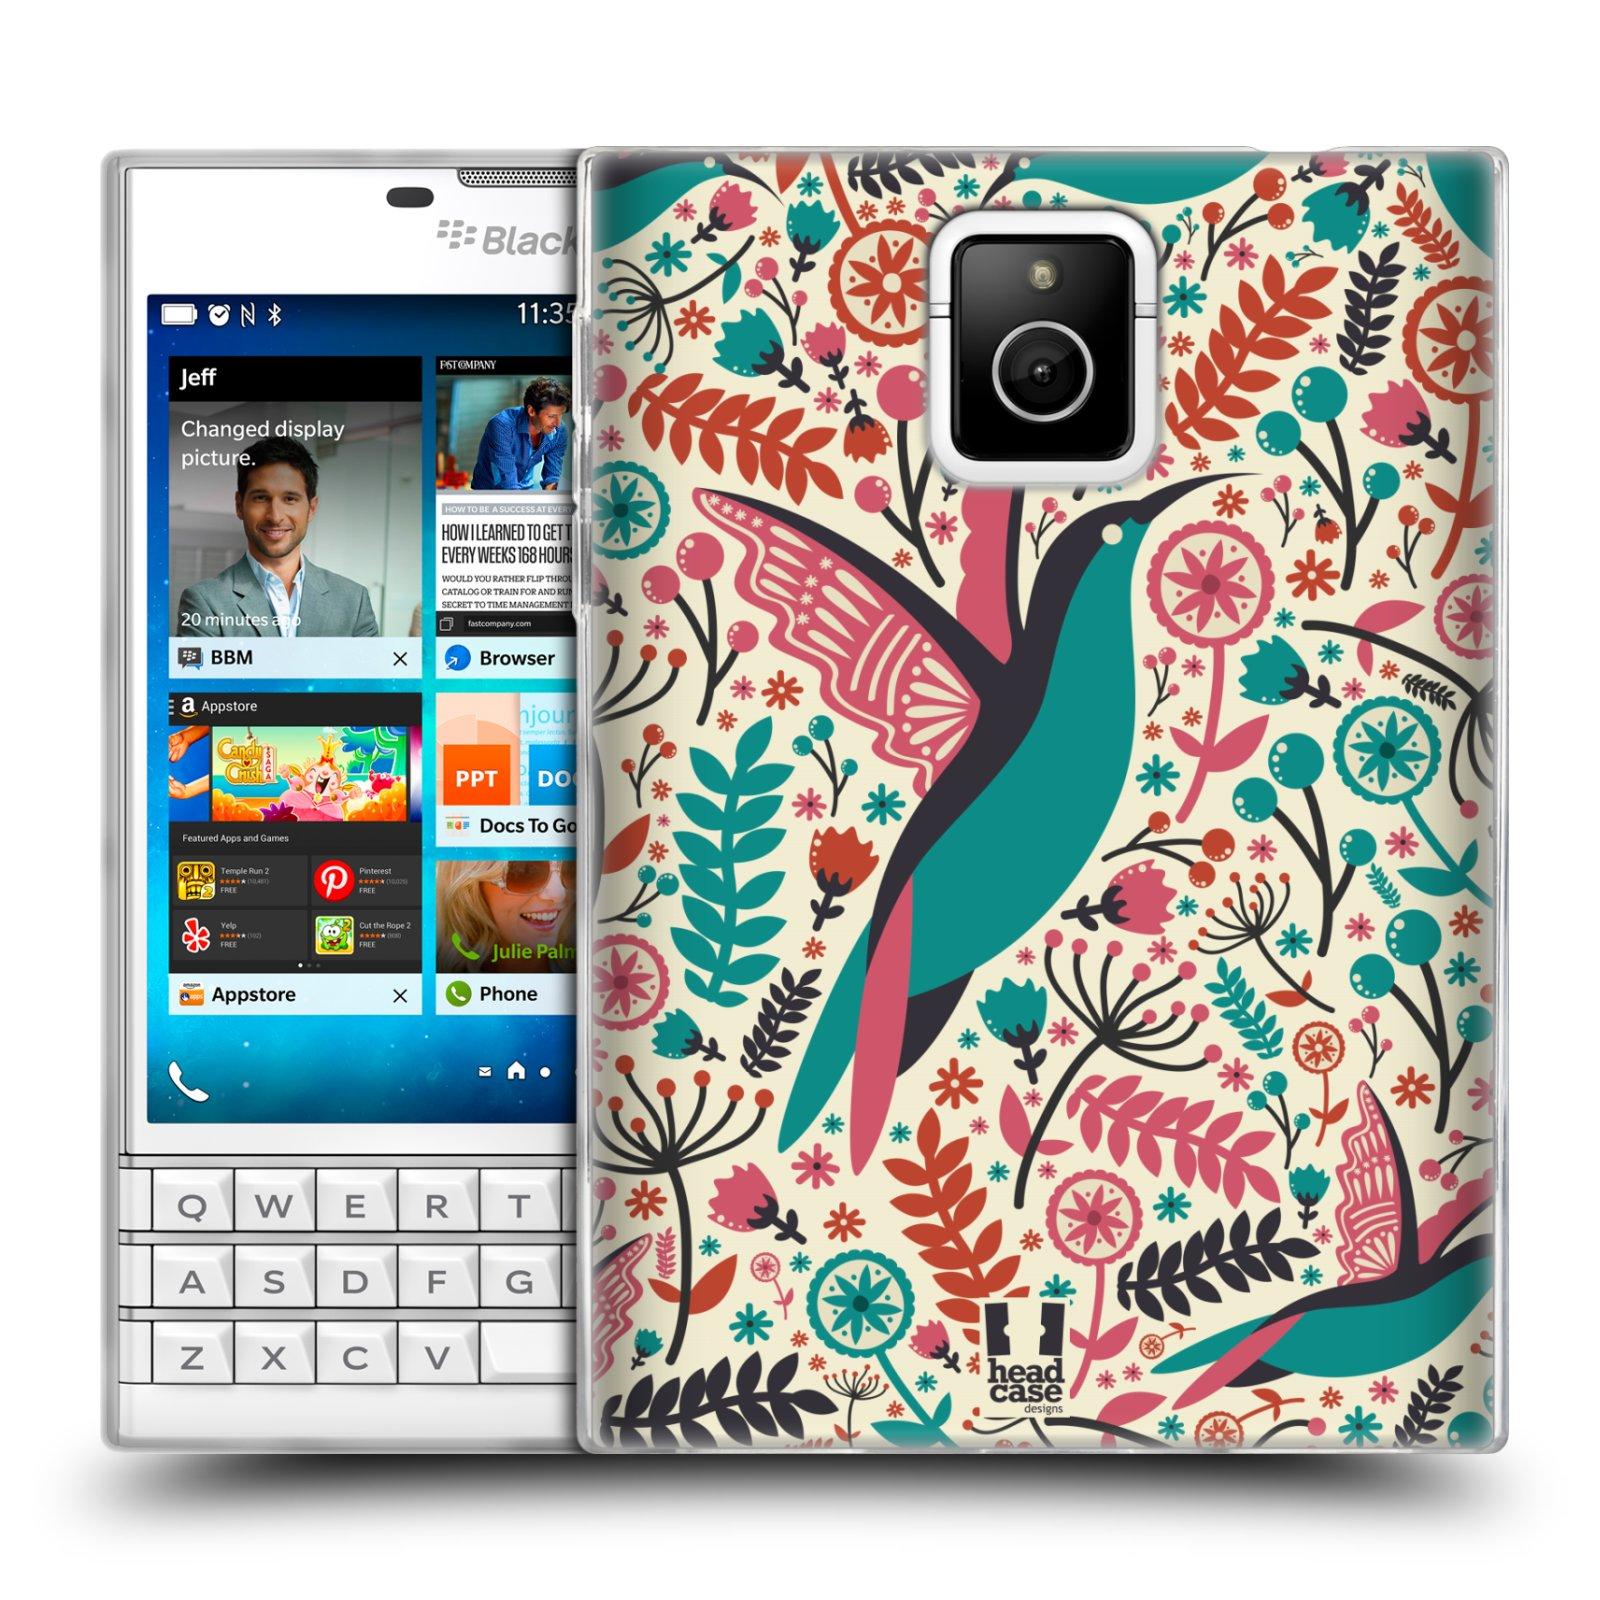 HEAD CASE silikonový obal na mobil Blackberry PASSPORT vzor kreslení ptáci kolibřík